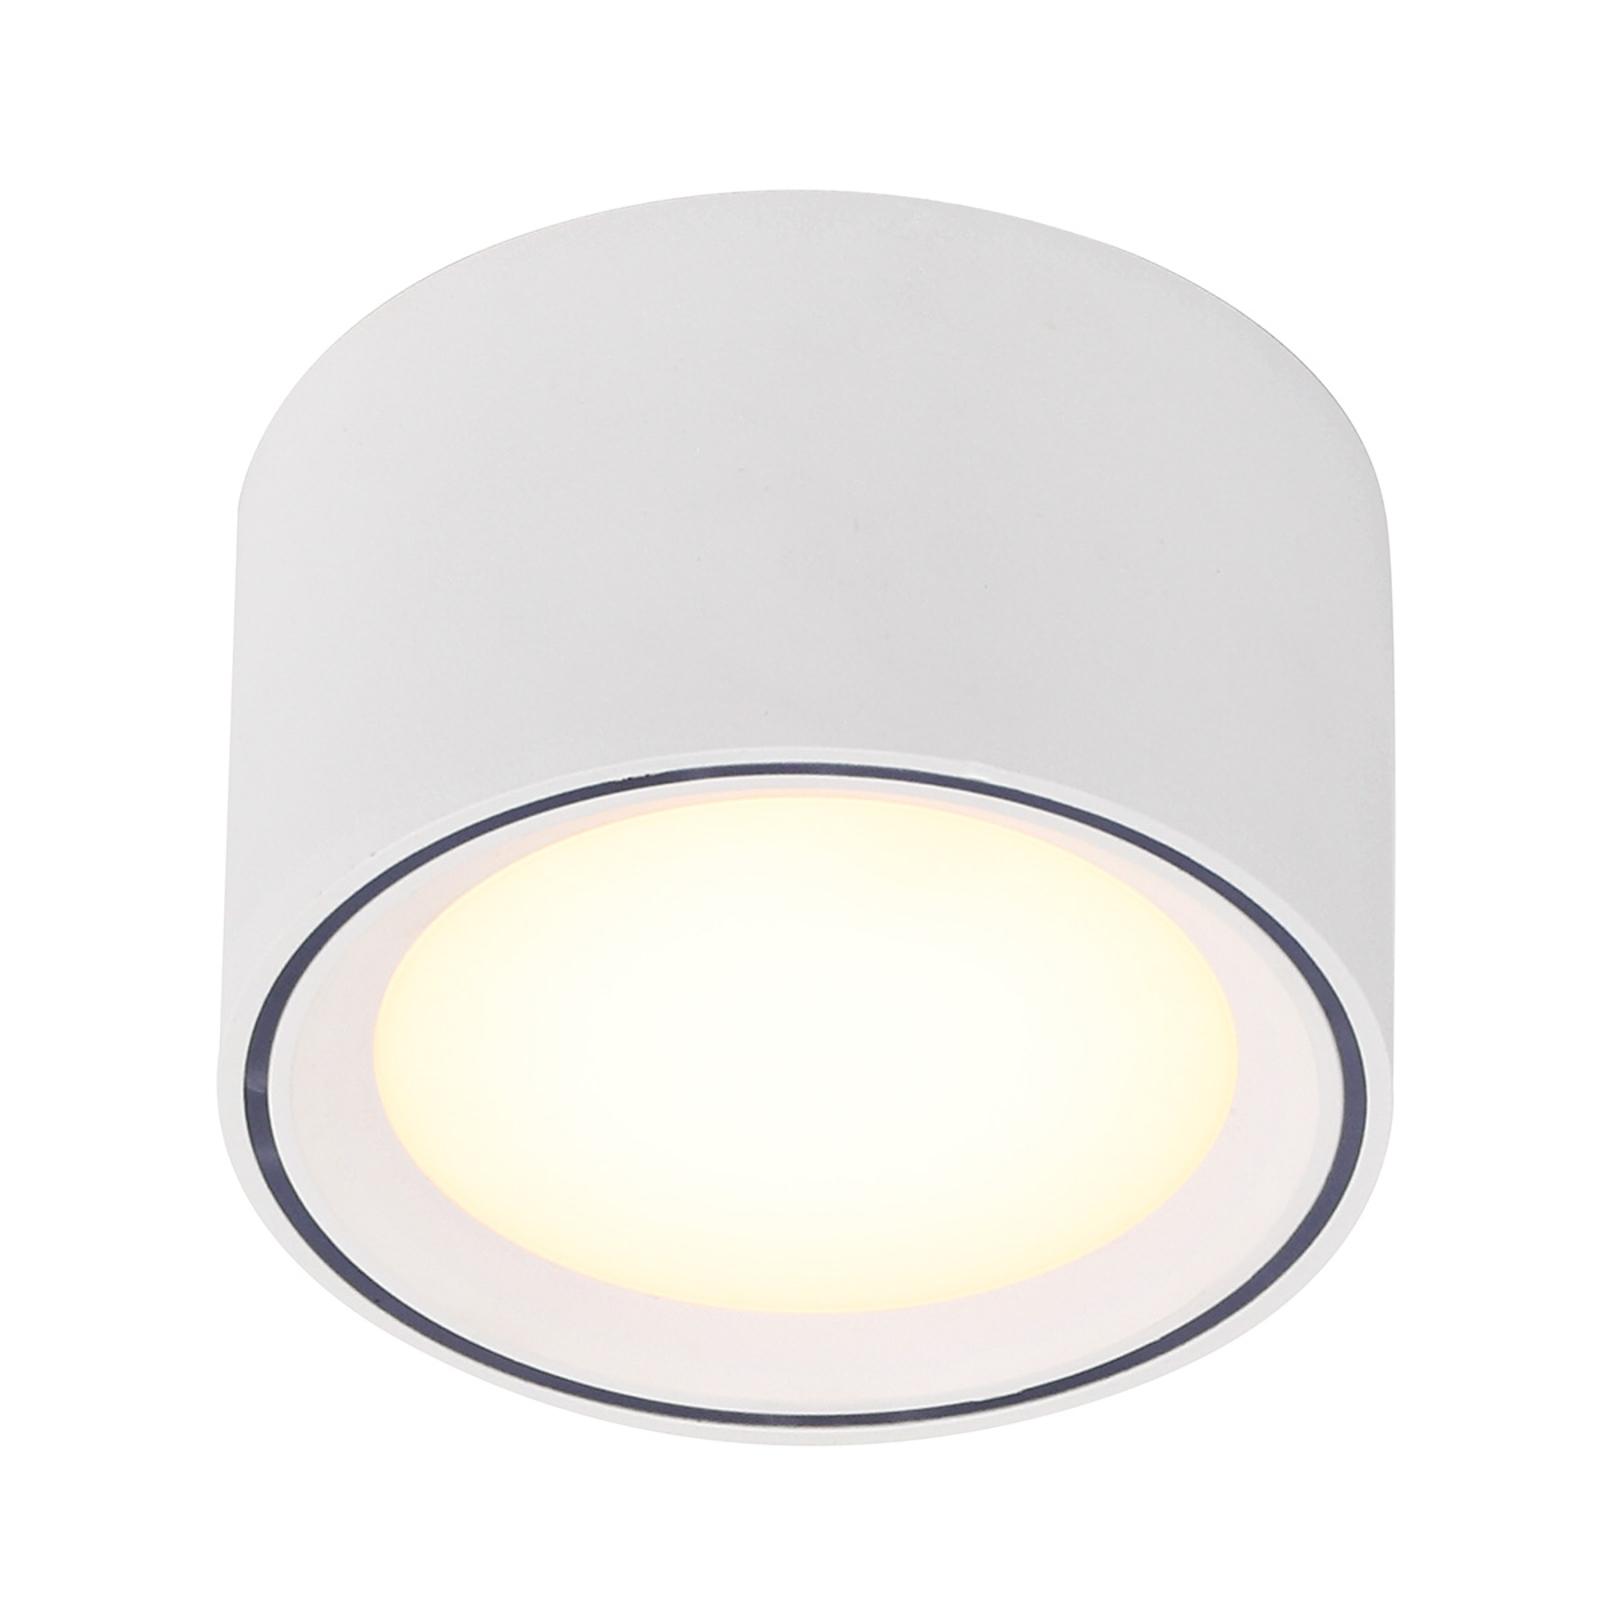 Lampa sufitowa LED Fallon, wysokość 6 cm